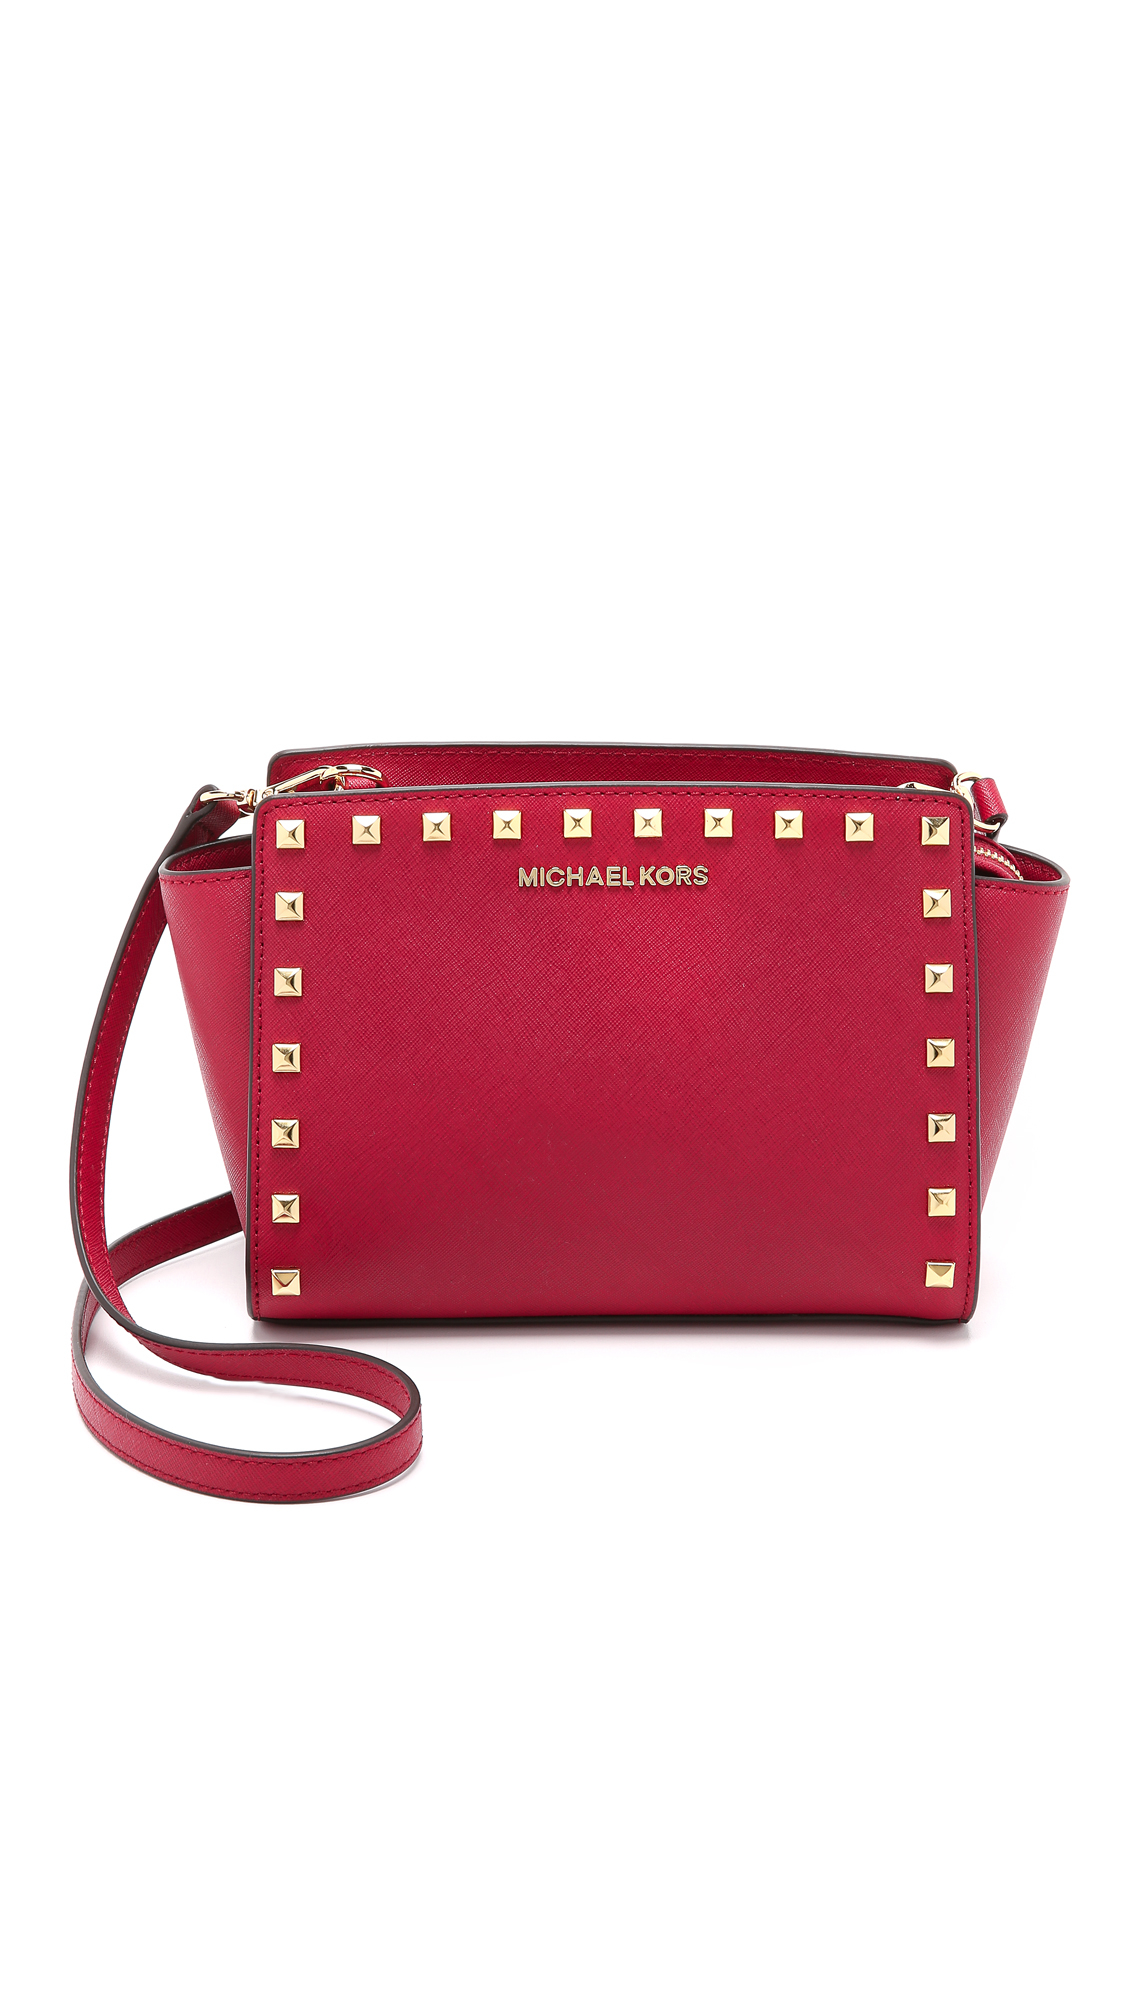 c21db2ae3859 ... discount code for michael michael kors selma stud medium messenger bag  cherry in red 2a9dd 92c41